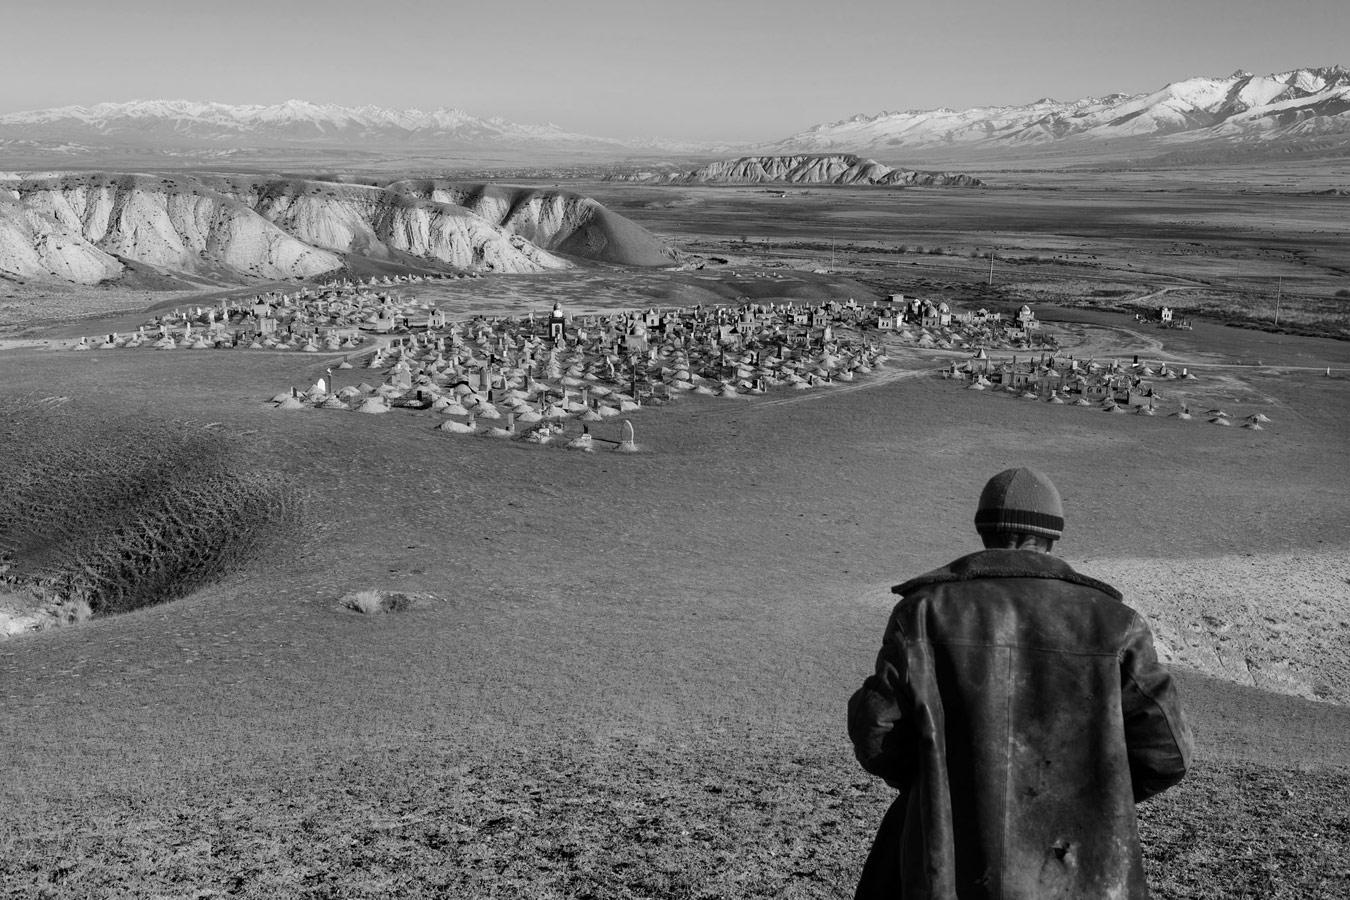 Фредерик Байккс / Frederik Buyckx, Финалист конкурса, Фотоконкурс ZEISS Photography Award